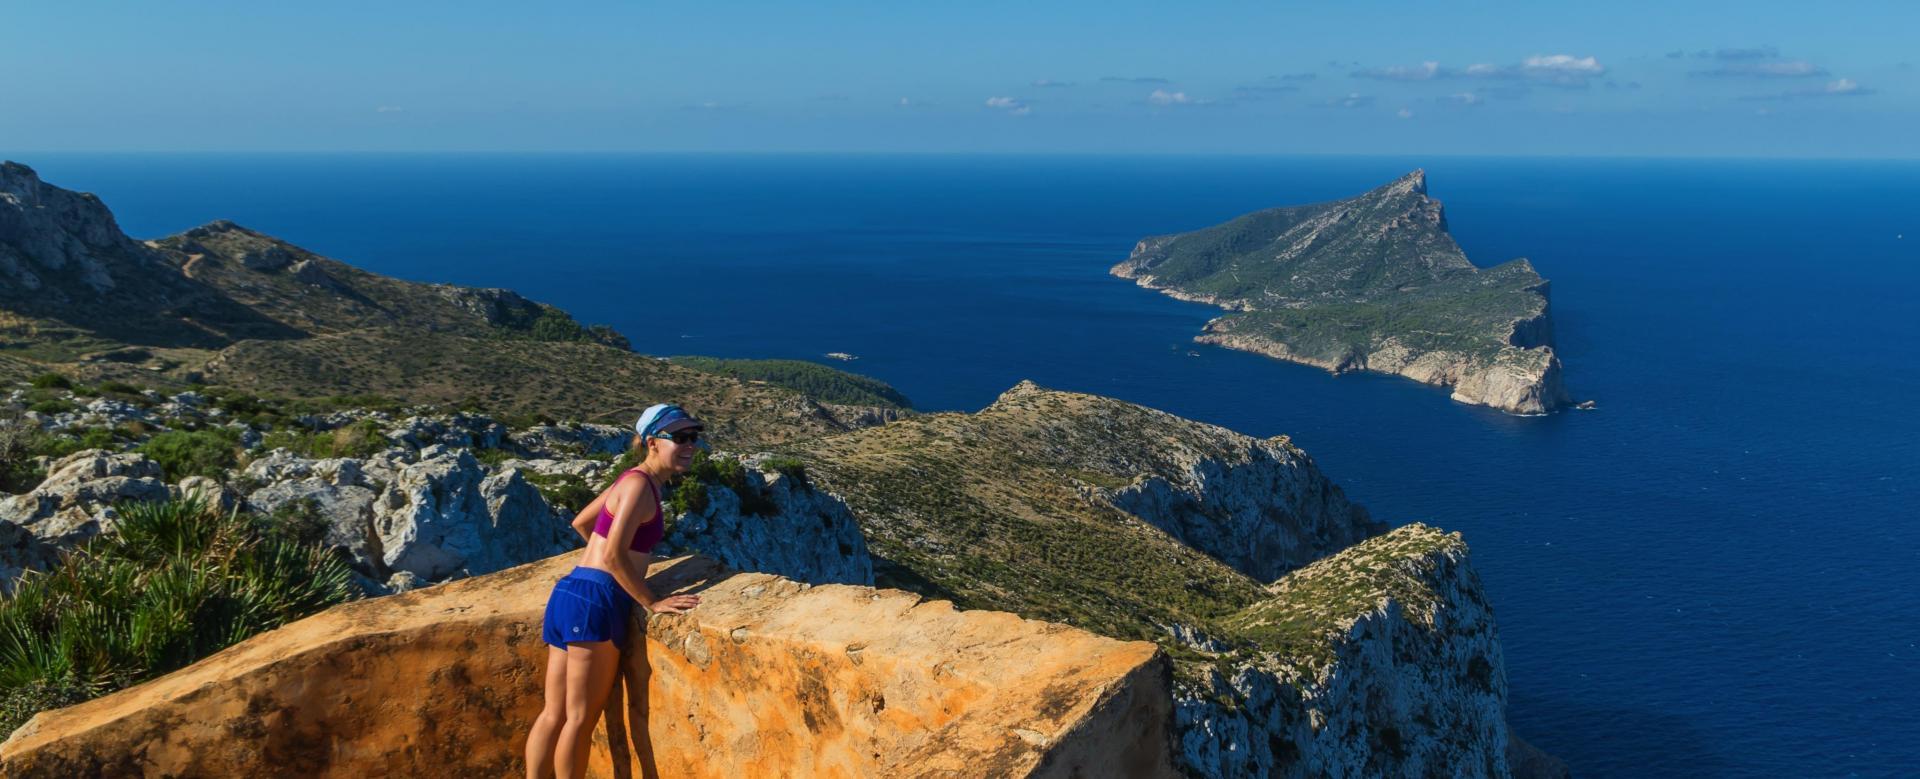 Voyage à pied Espagne : Majorque et minorque